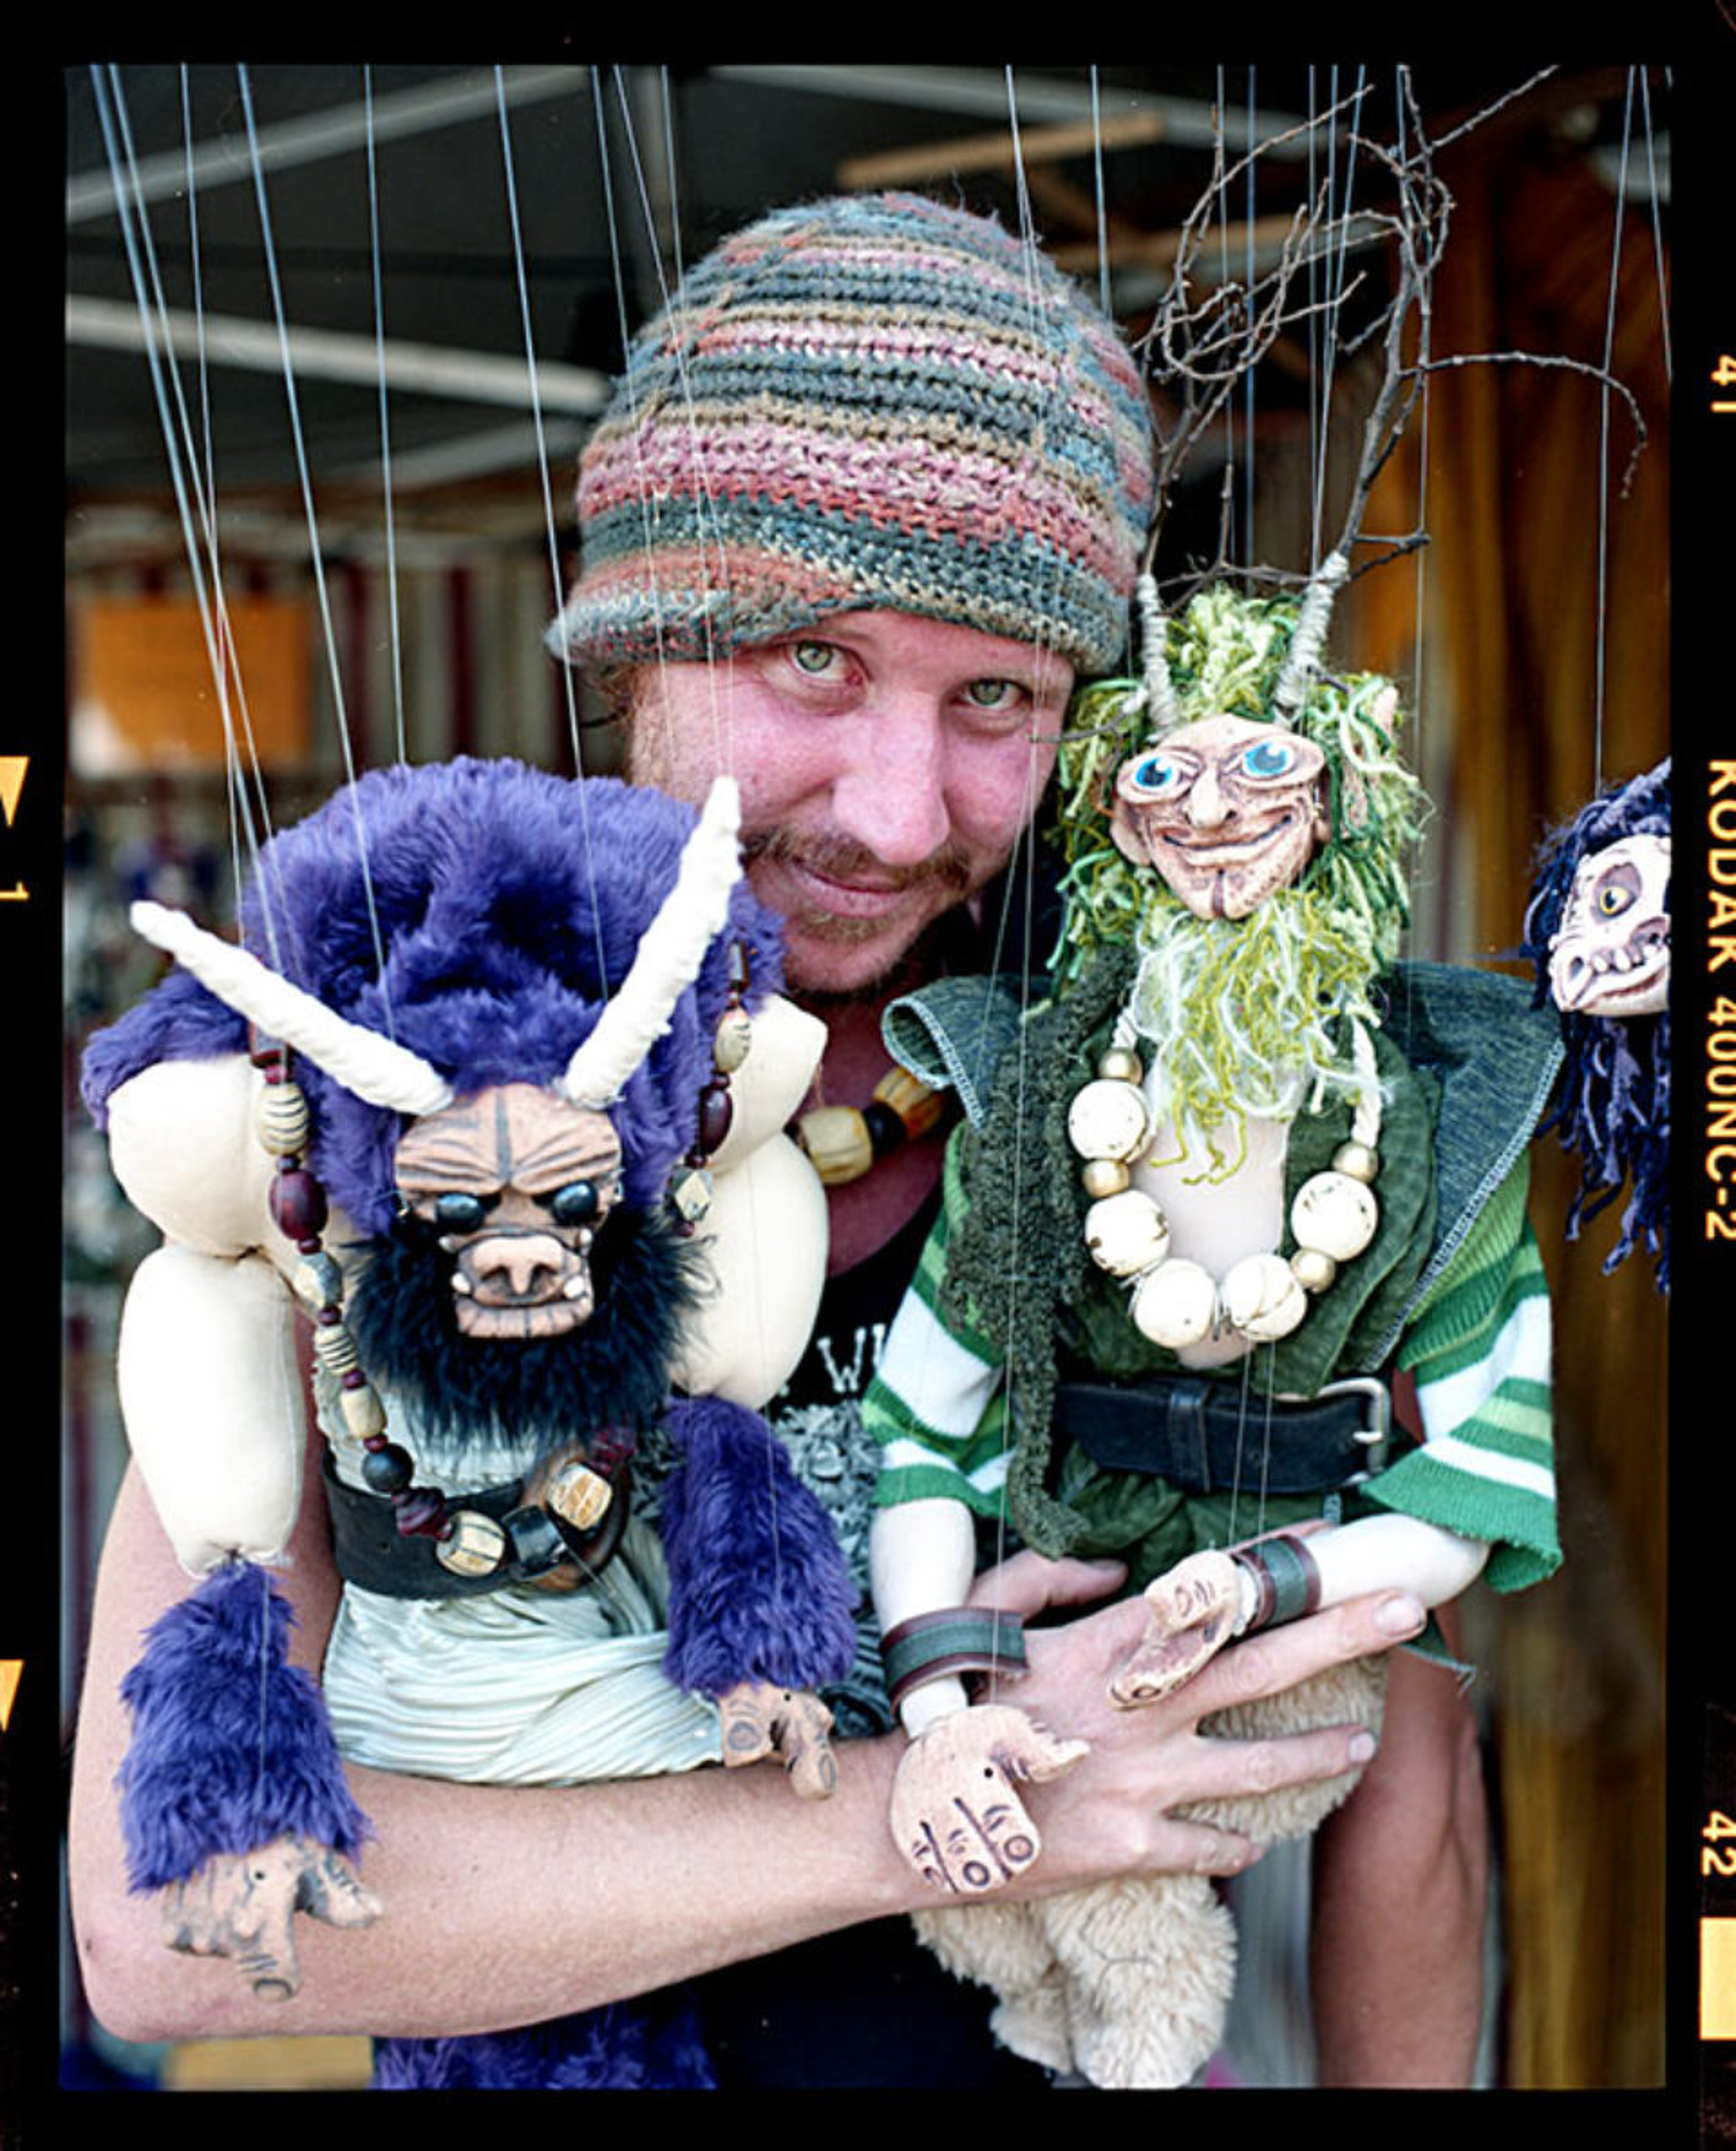 Woodford folk festival 04